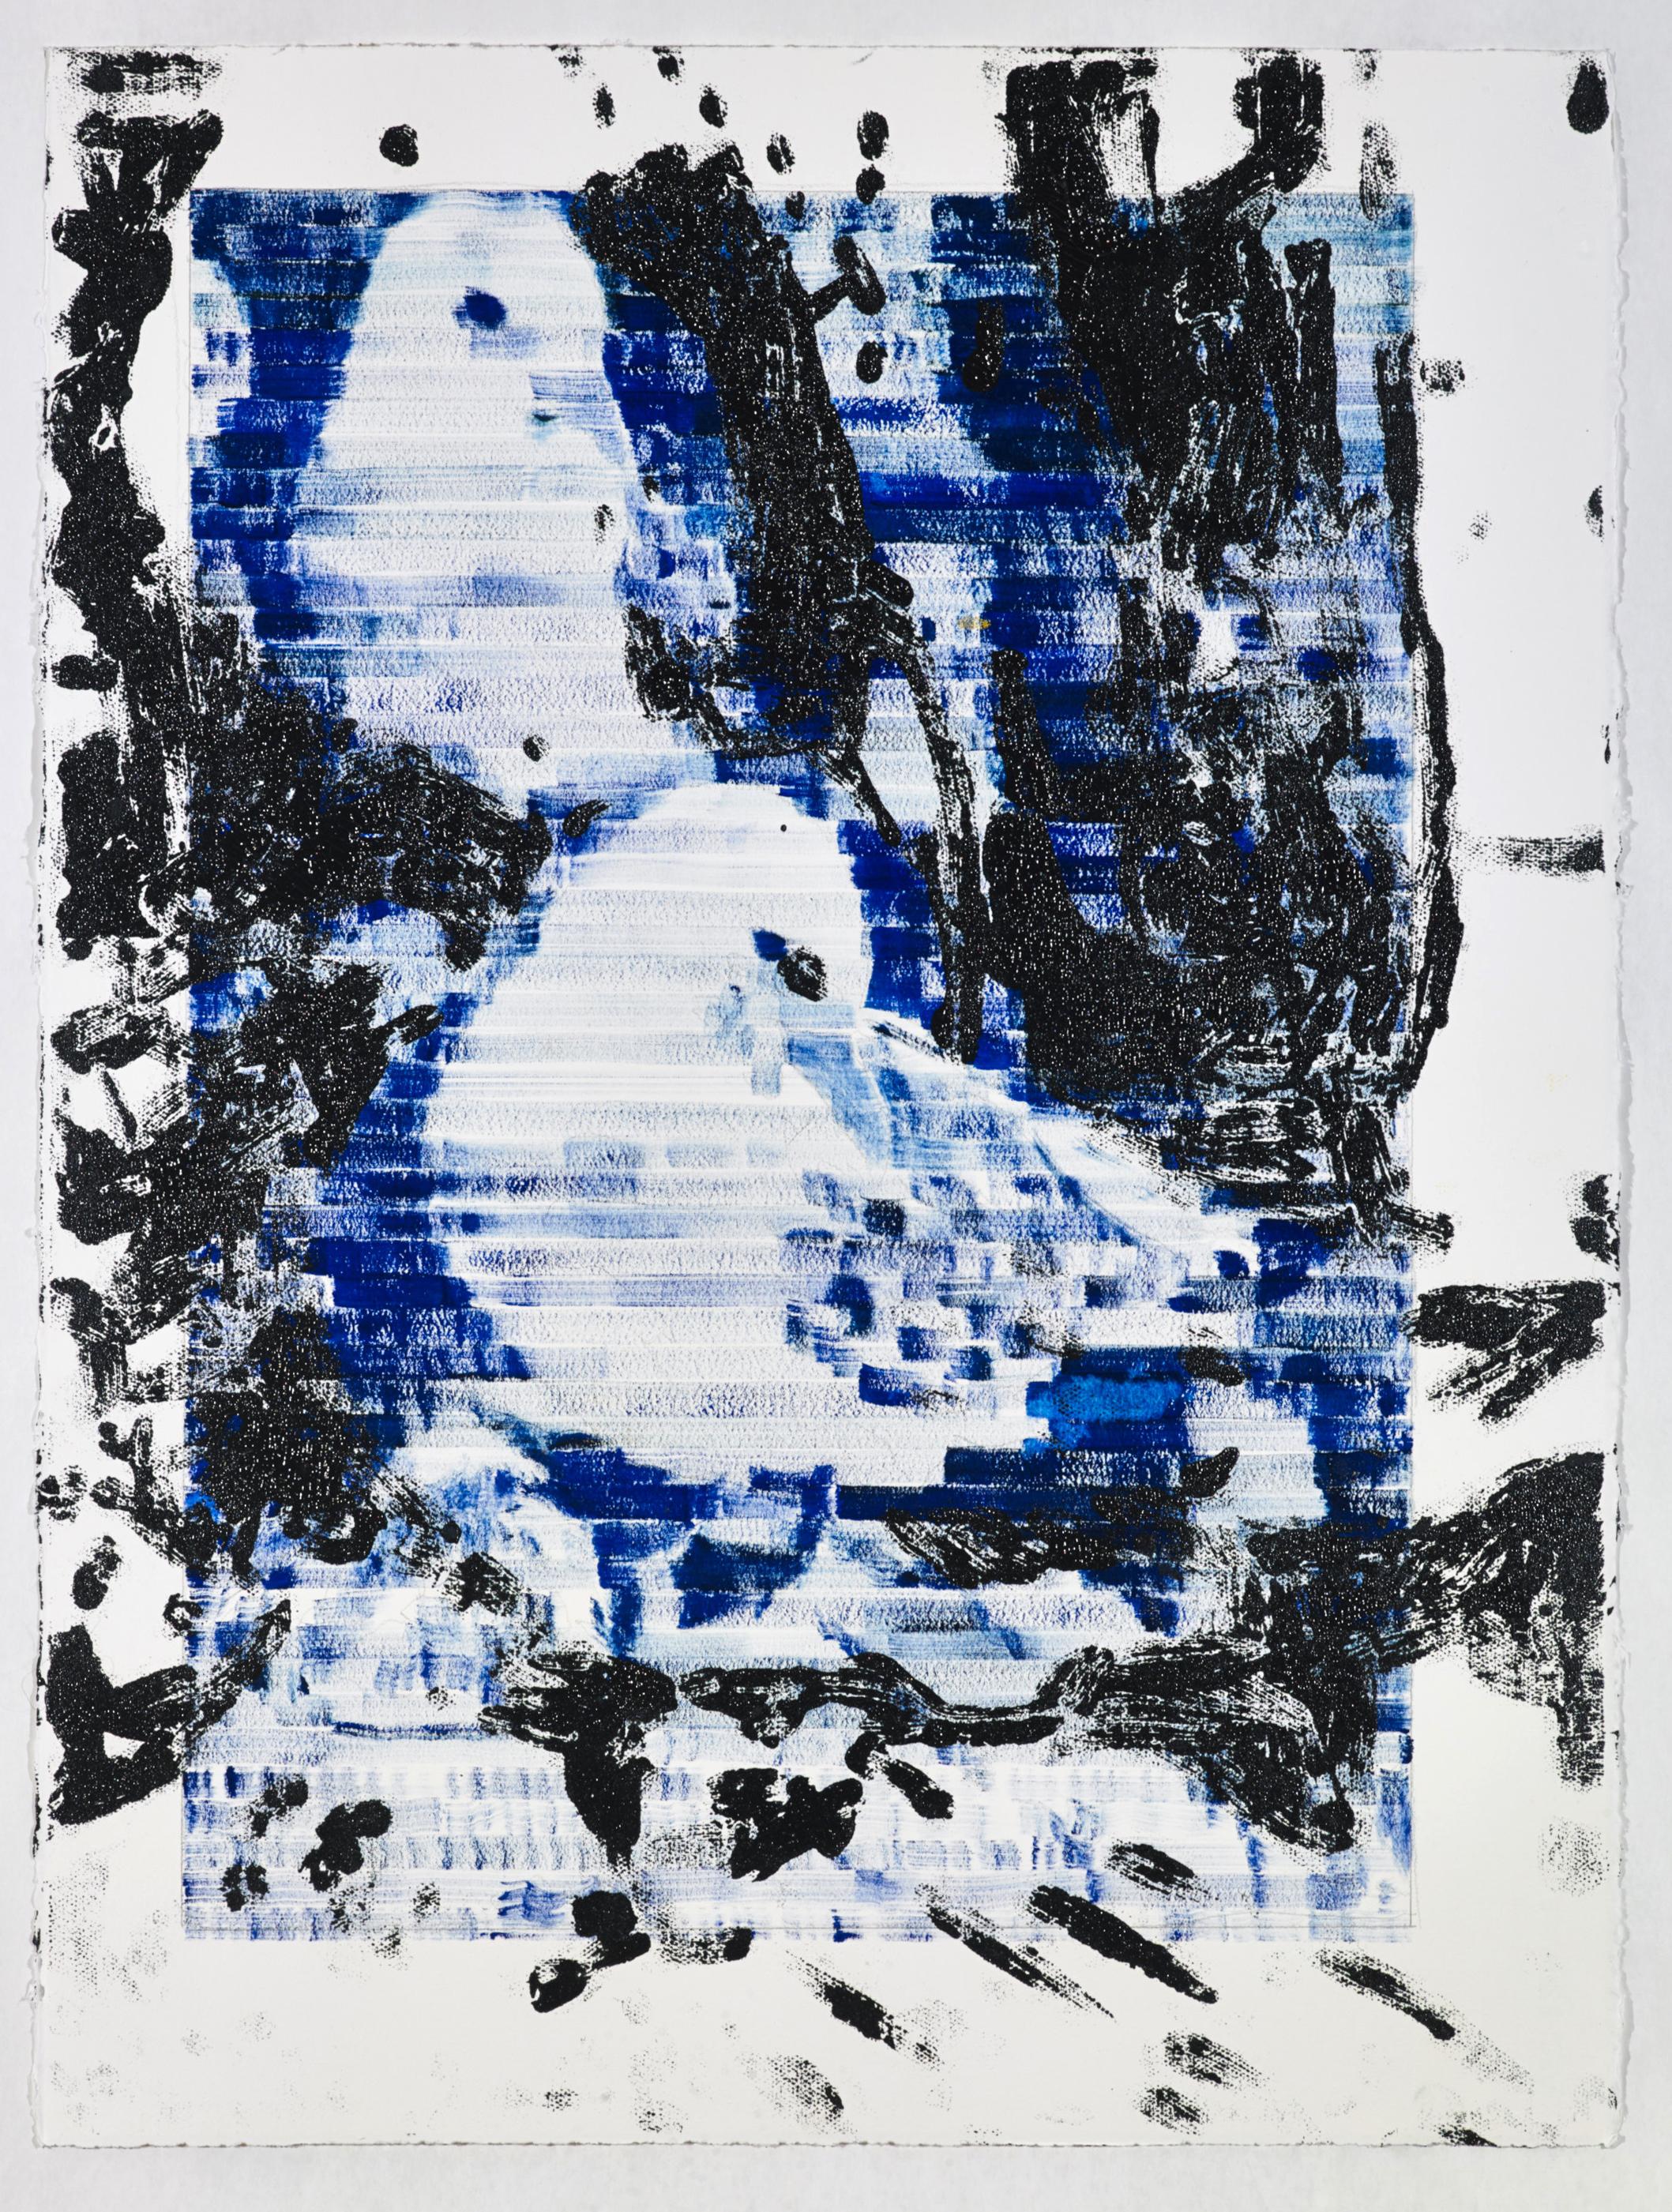 Jered Sprecher, Visit , 30 x 22, oil on paper, 2012